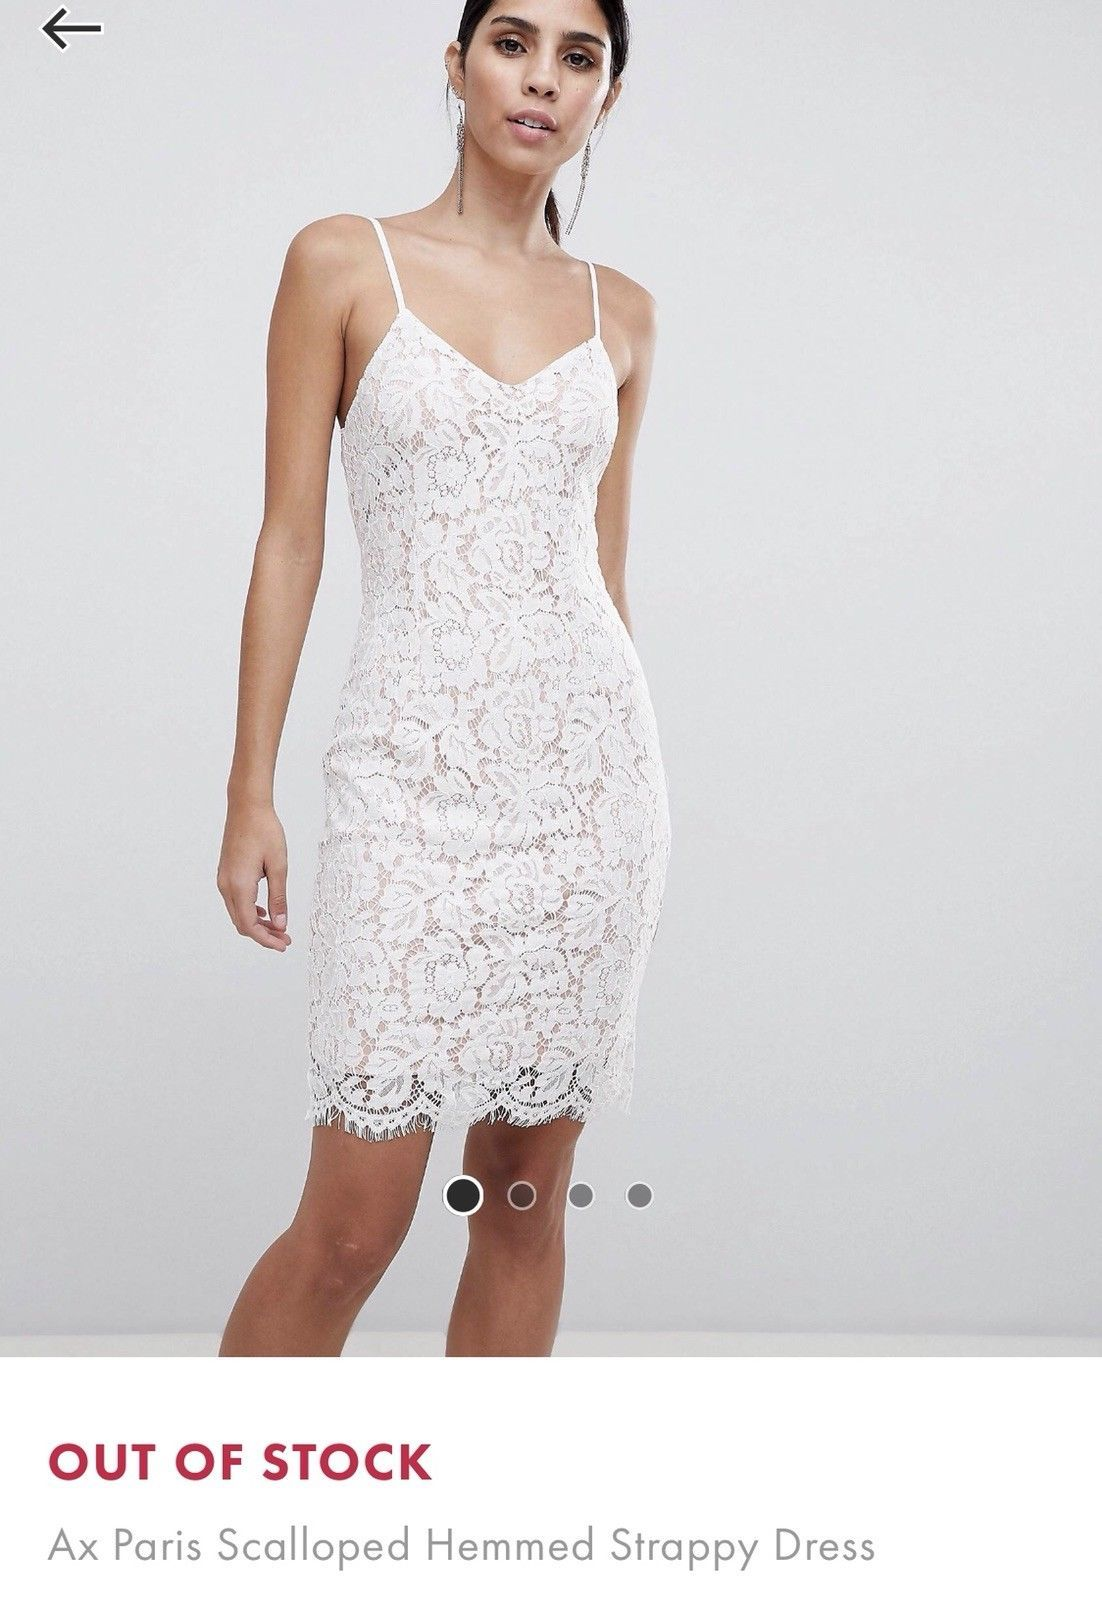 40 00 White Lace Spaghetti Strap Bodycon Womens Dress Asos New With Tags Wedding Chic Spaghetti Bodycon Wom Womens Dresses White Lace Spaghetti Strap [ 1600 x 1102 Pixel ]